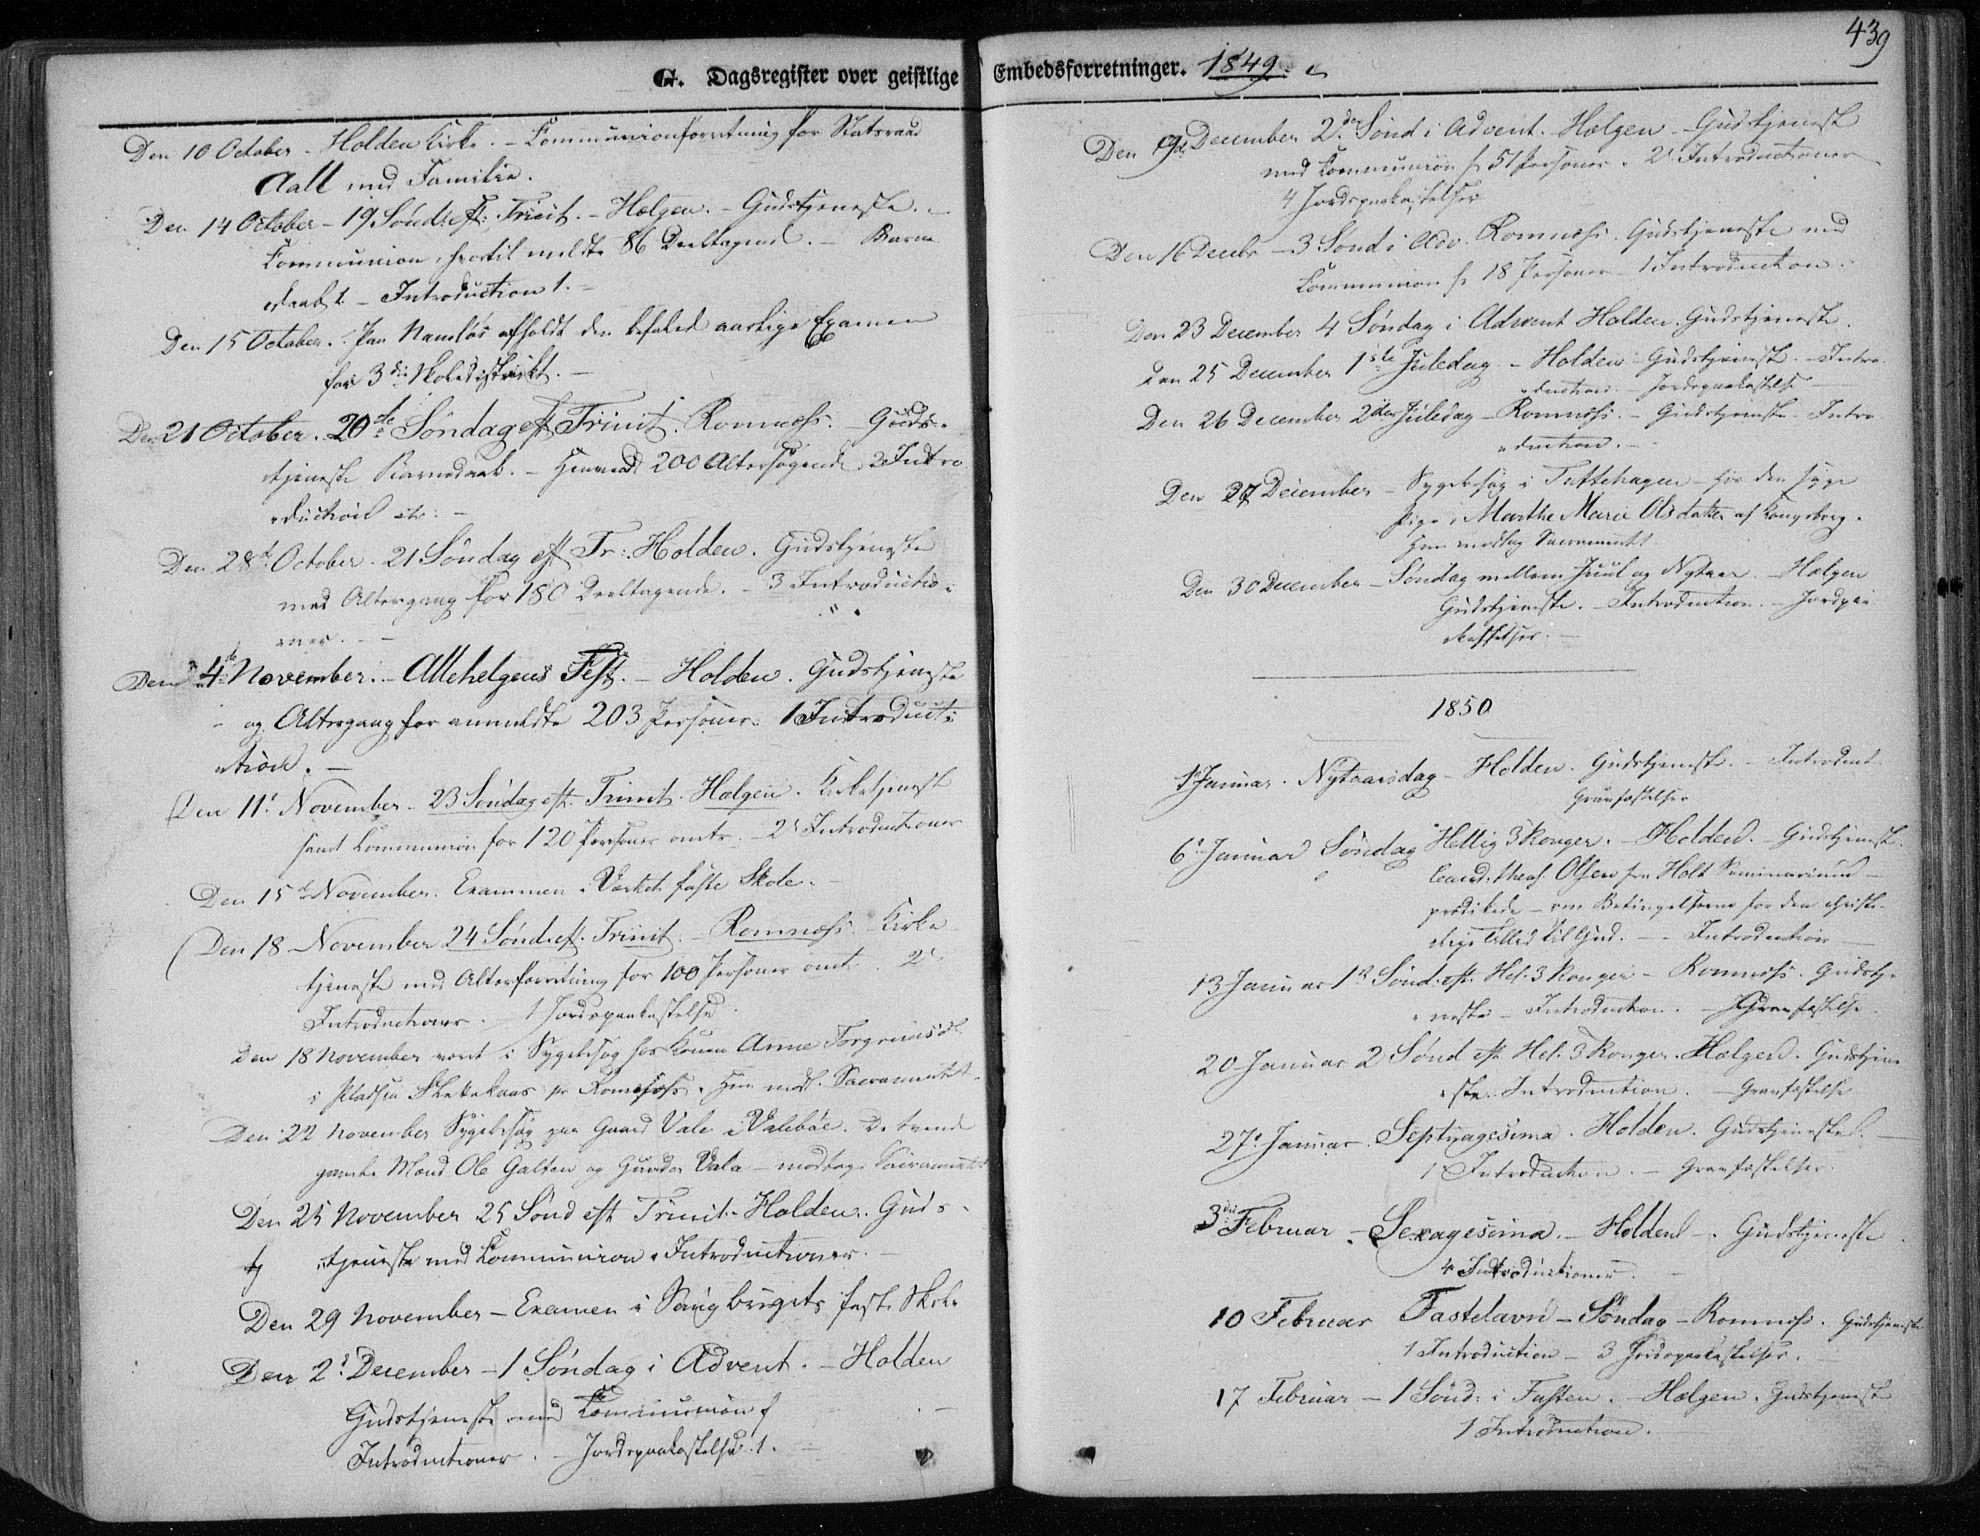 SAKO, Holla kirkebøker, F/Fa/L0005: Ministerialbok nr. 5, 1849-1860, s. 439